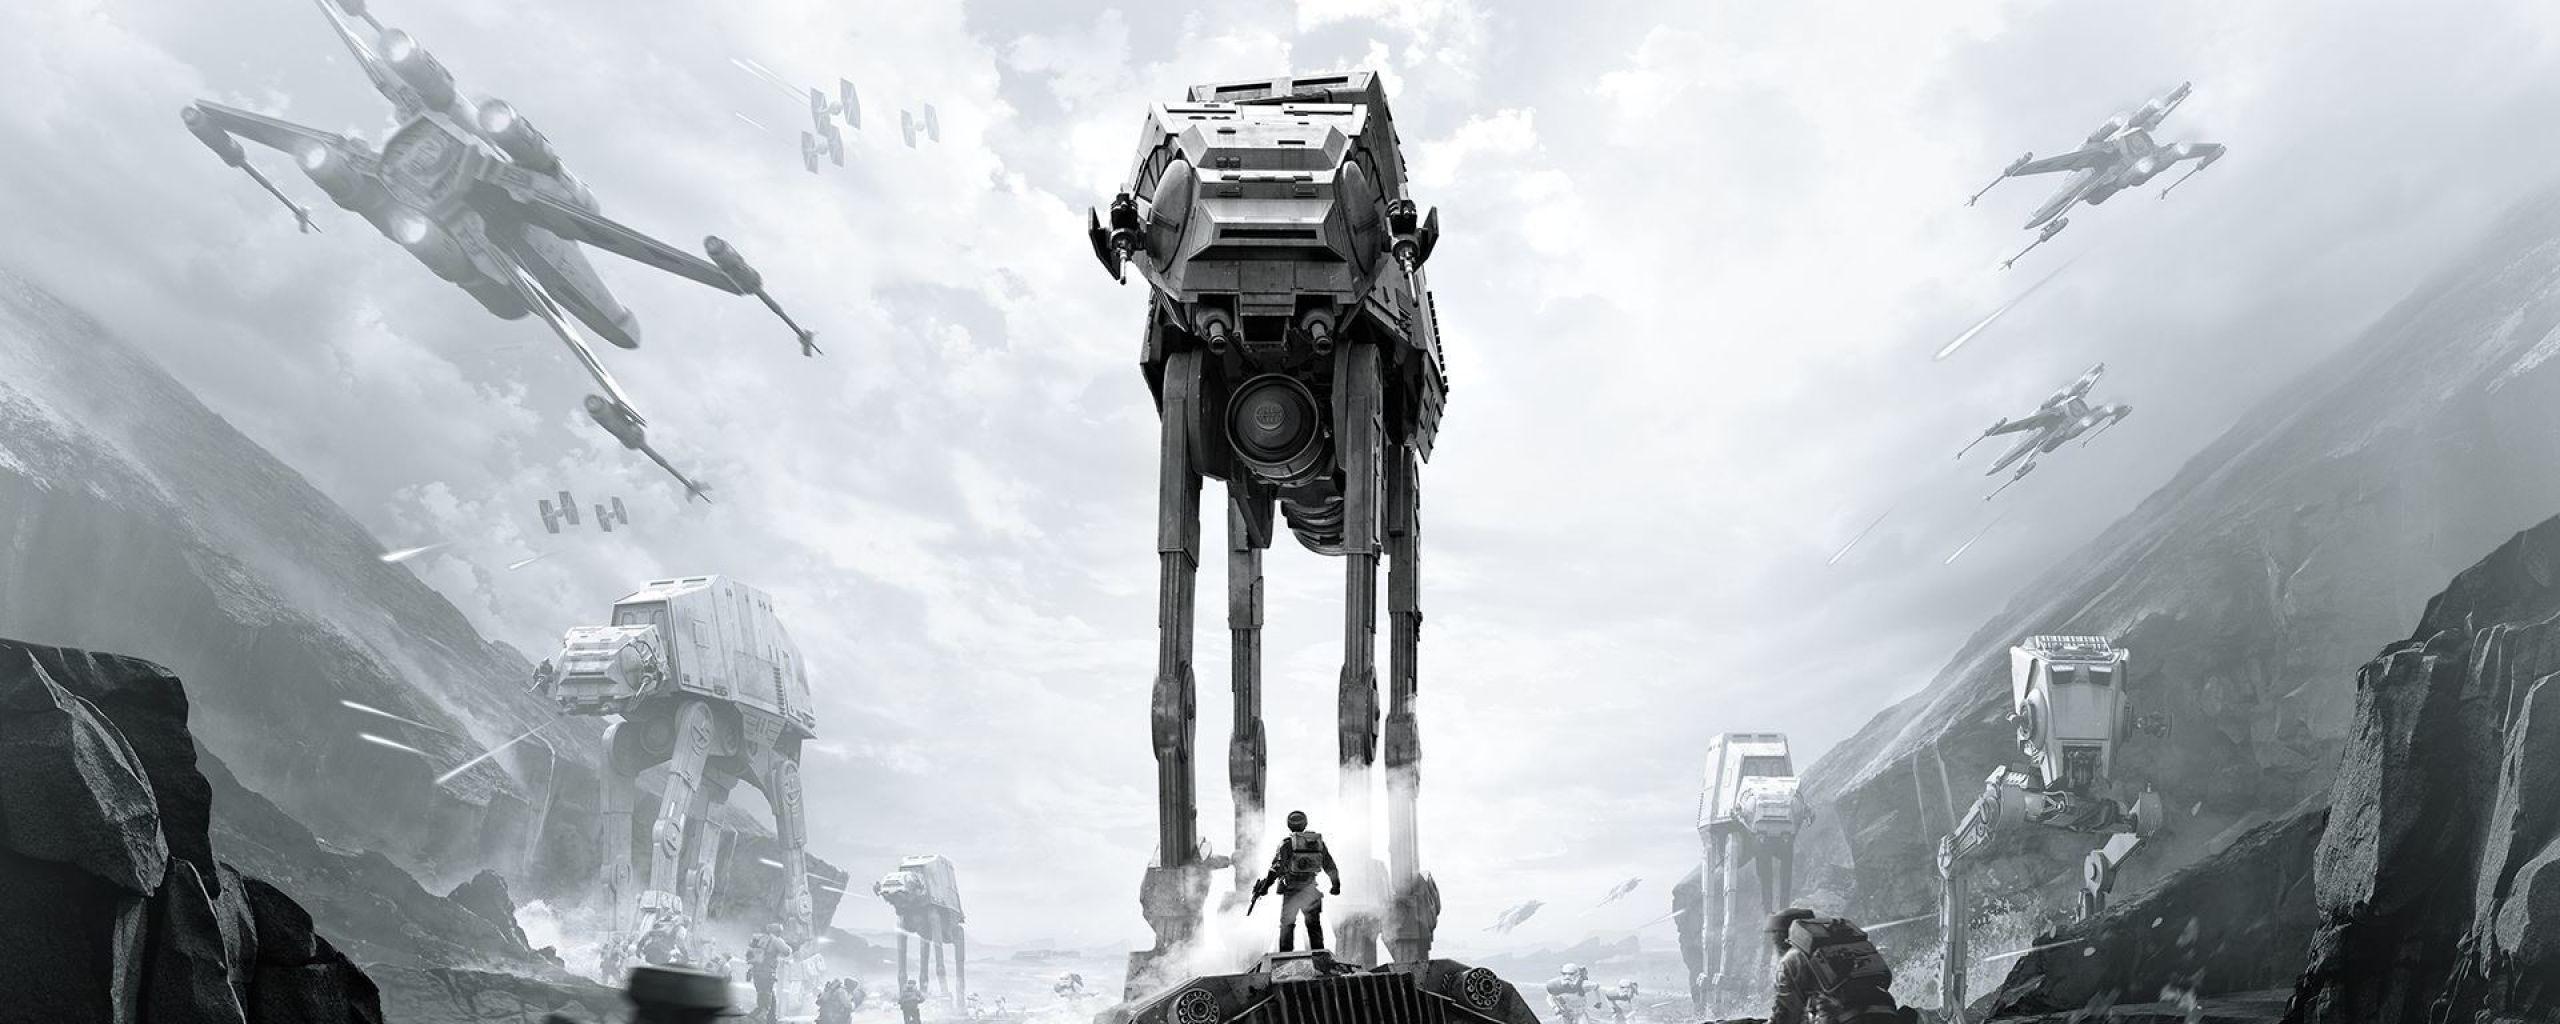 Dual Screen Wallpaper Hd Star Wars Star Wars Battlefront 2 2560x1024 Download Hd Wallpaper Wallpapertip